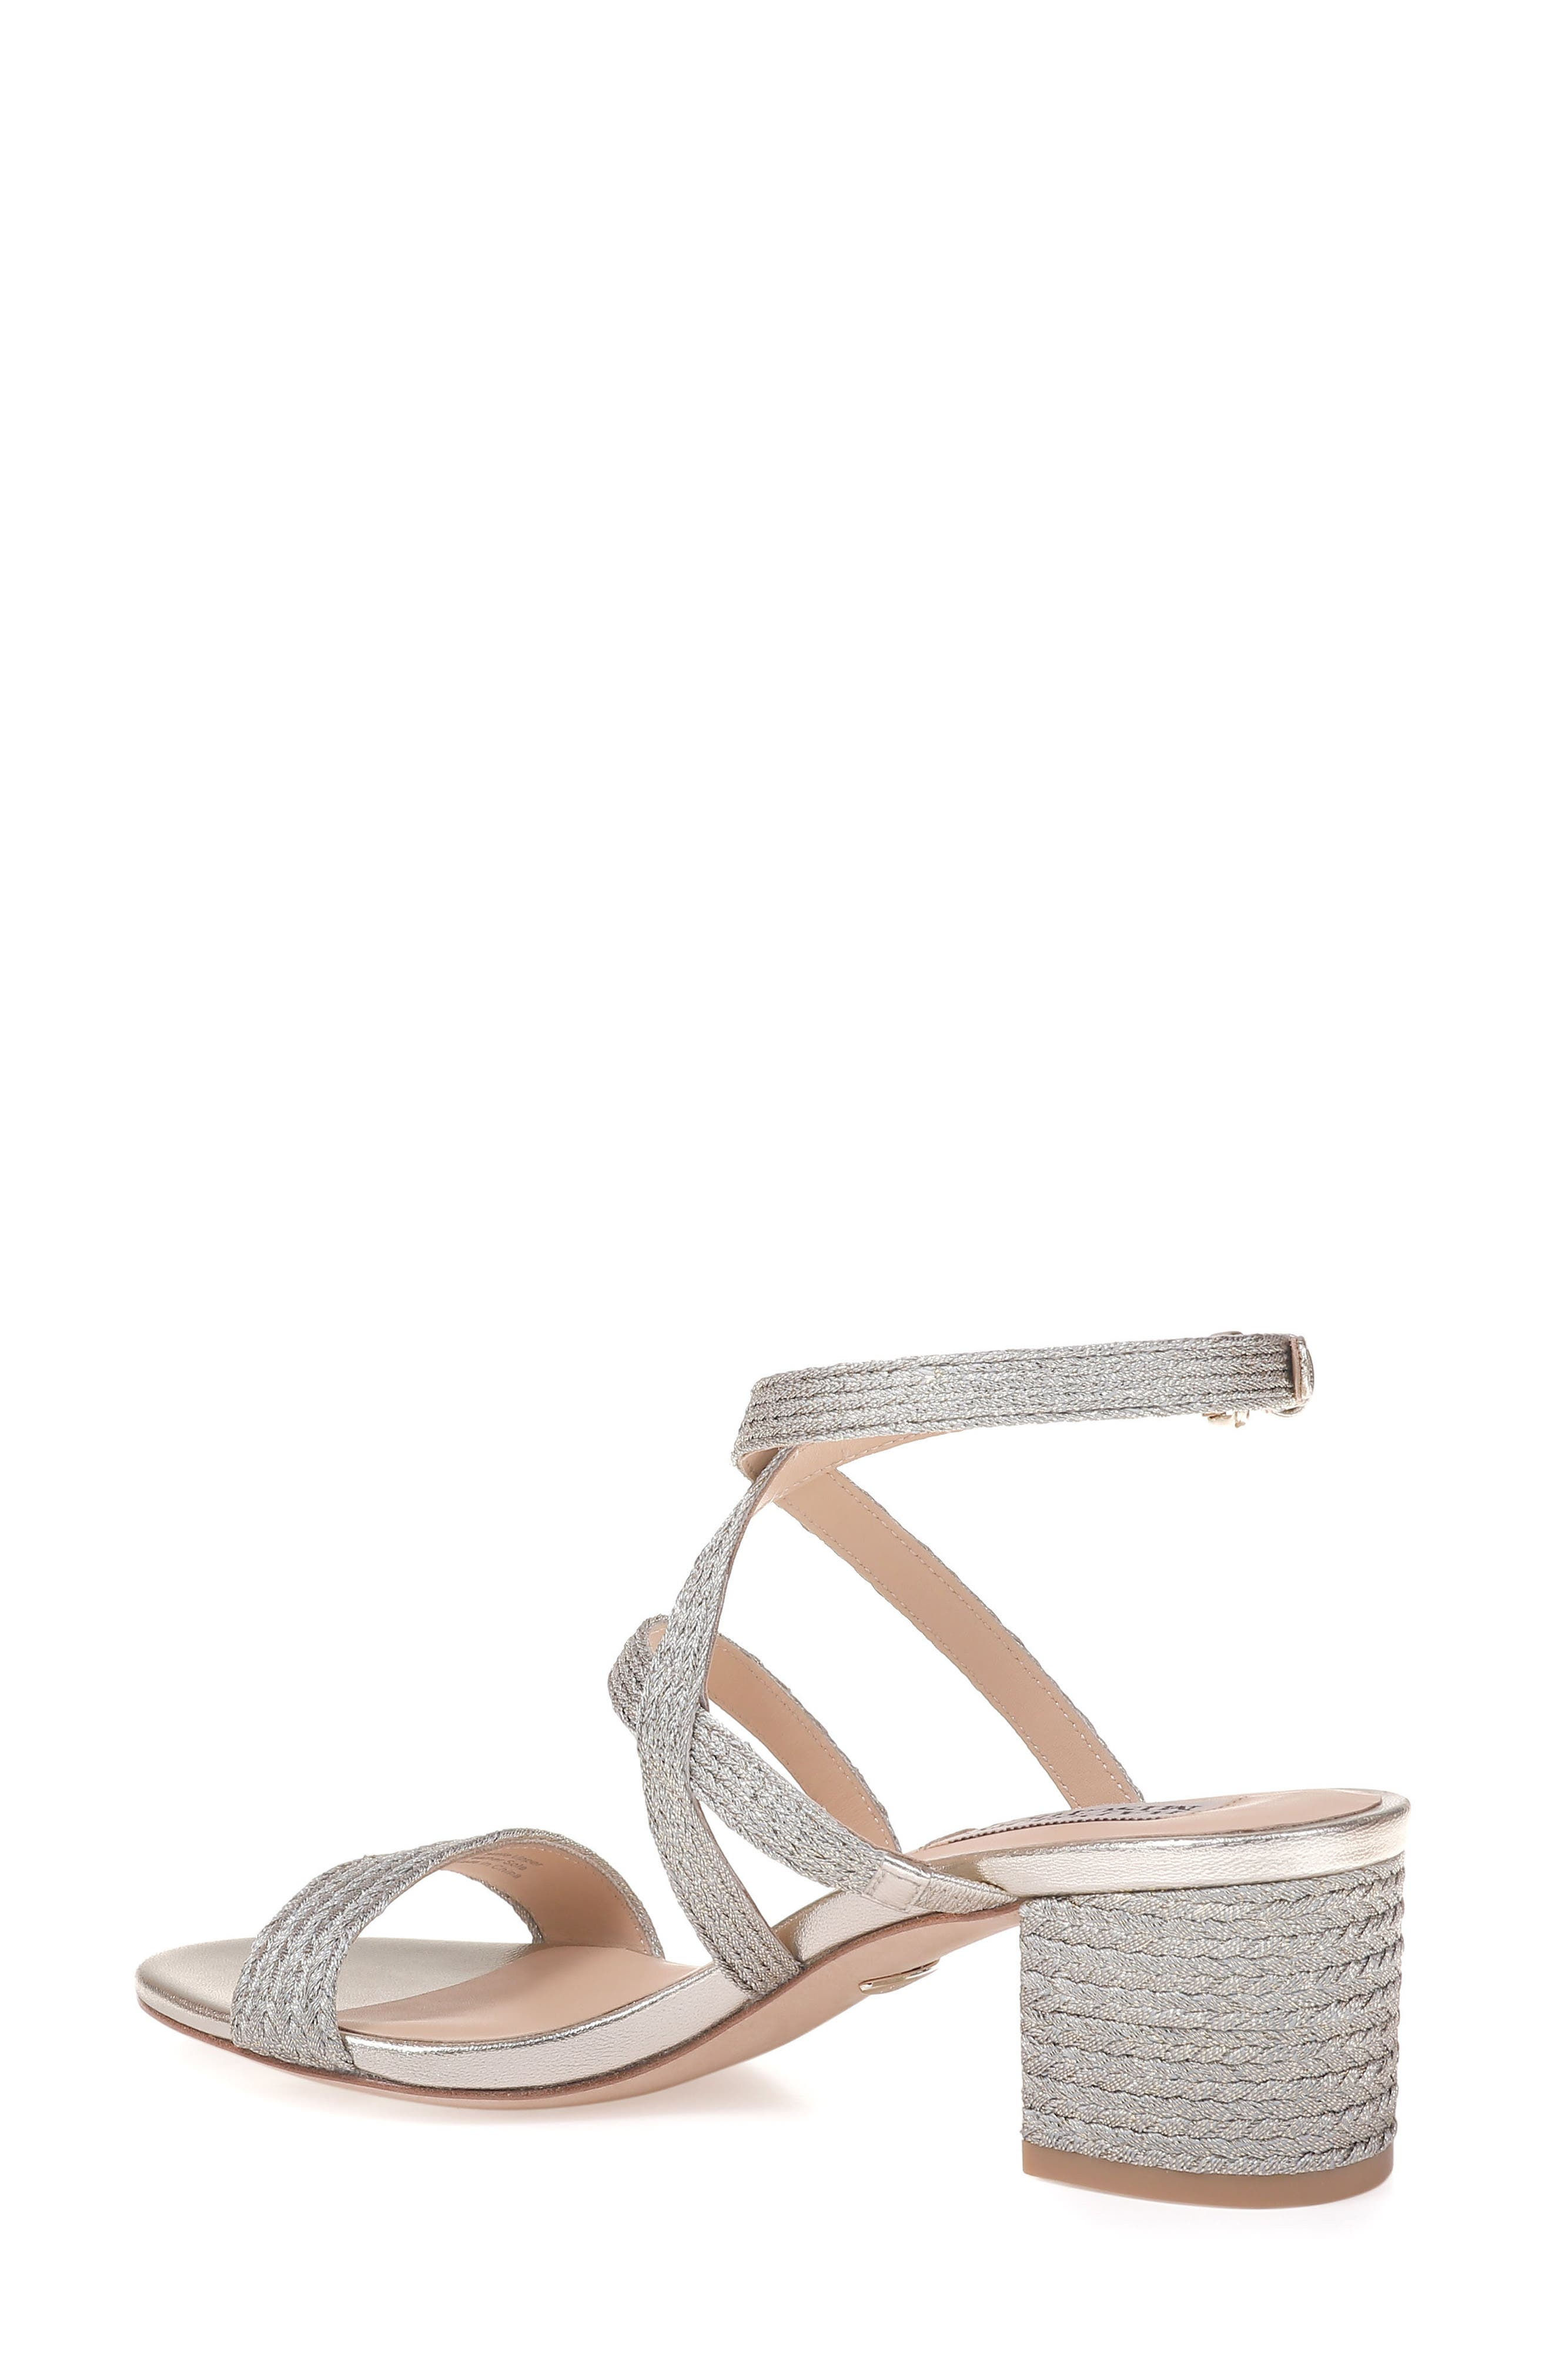 Storm Block Heel Sandal,                             Alternate thumbnail 2, color,                             PLATINO FABRIC